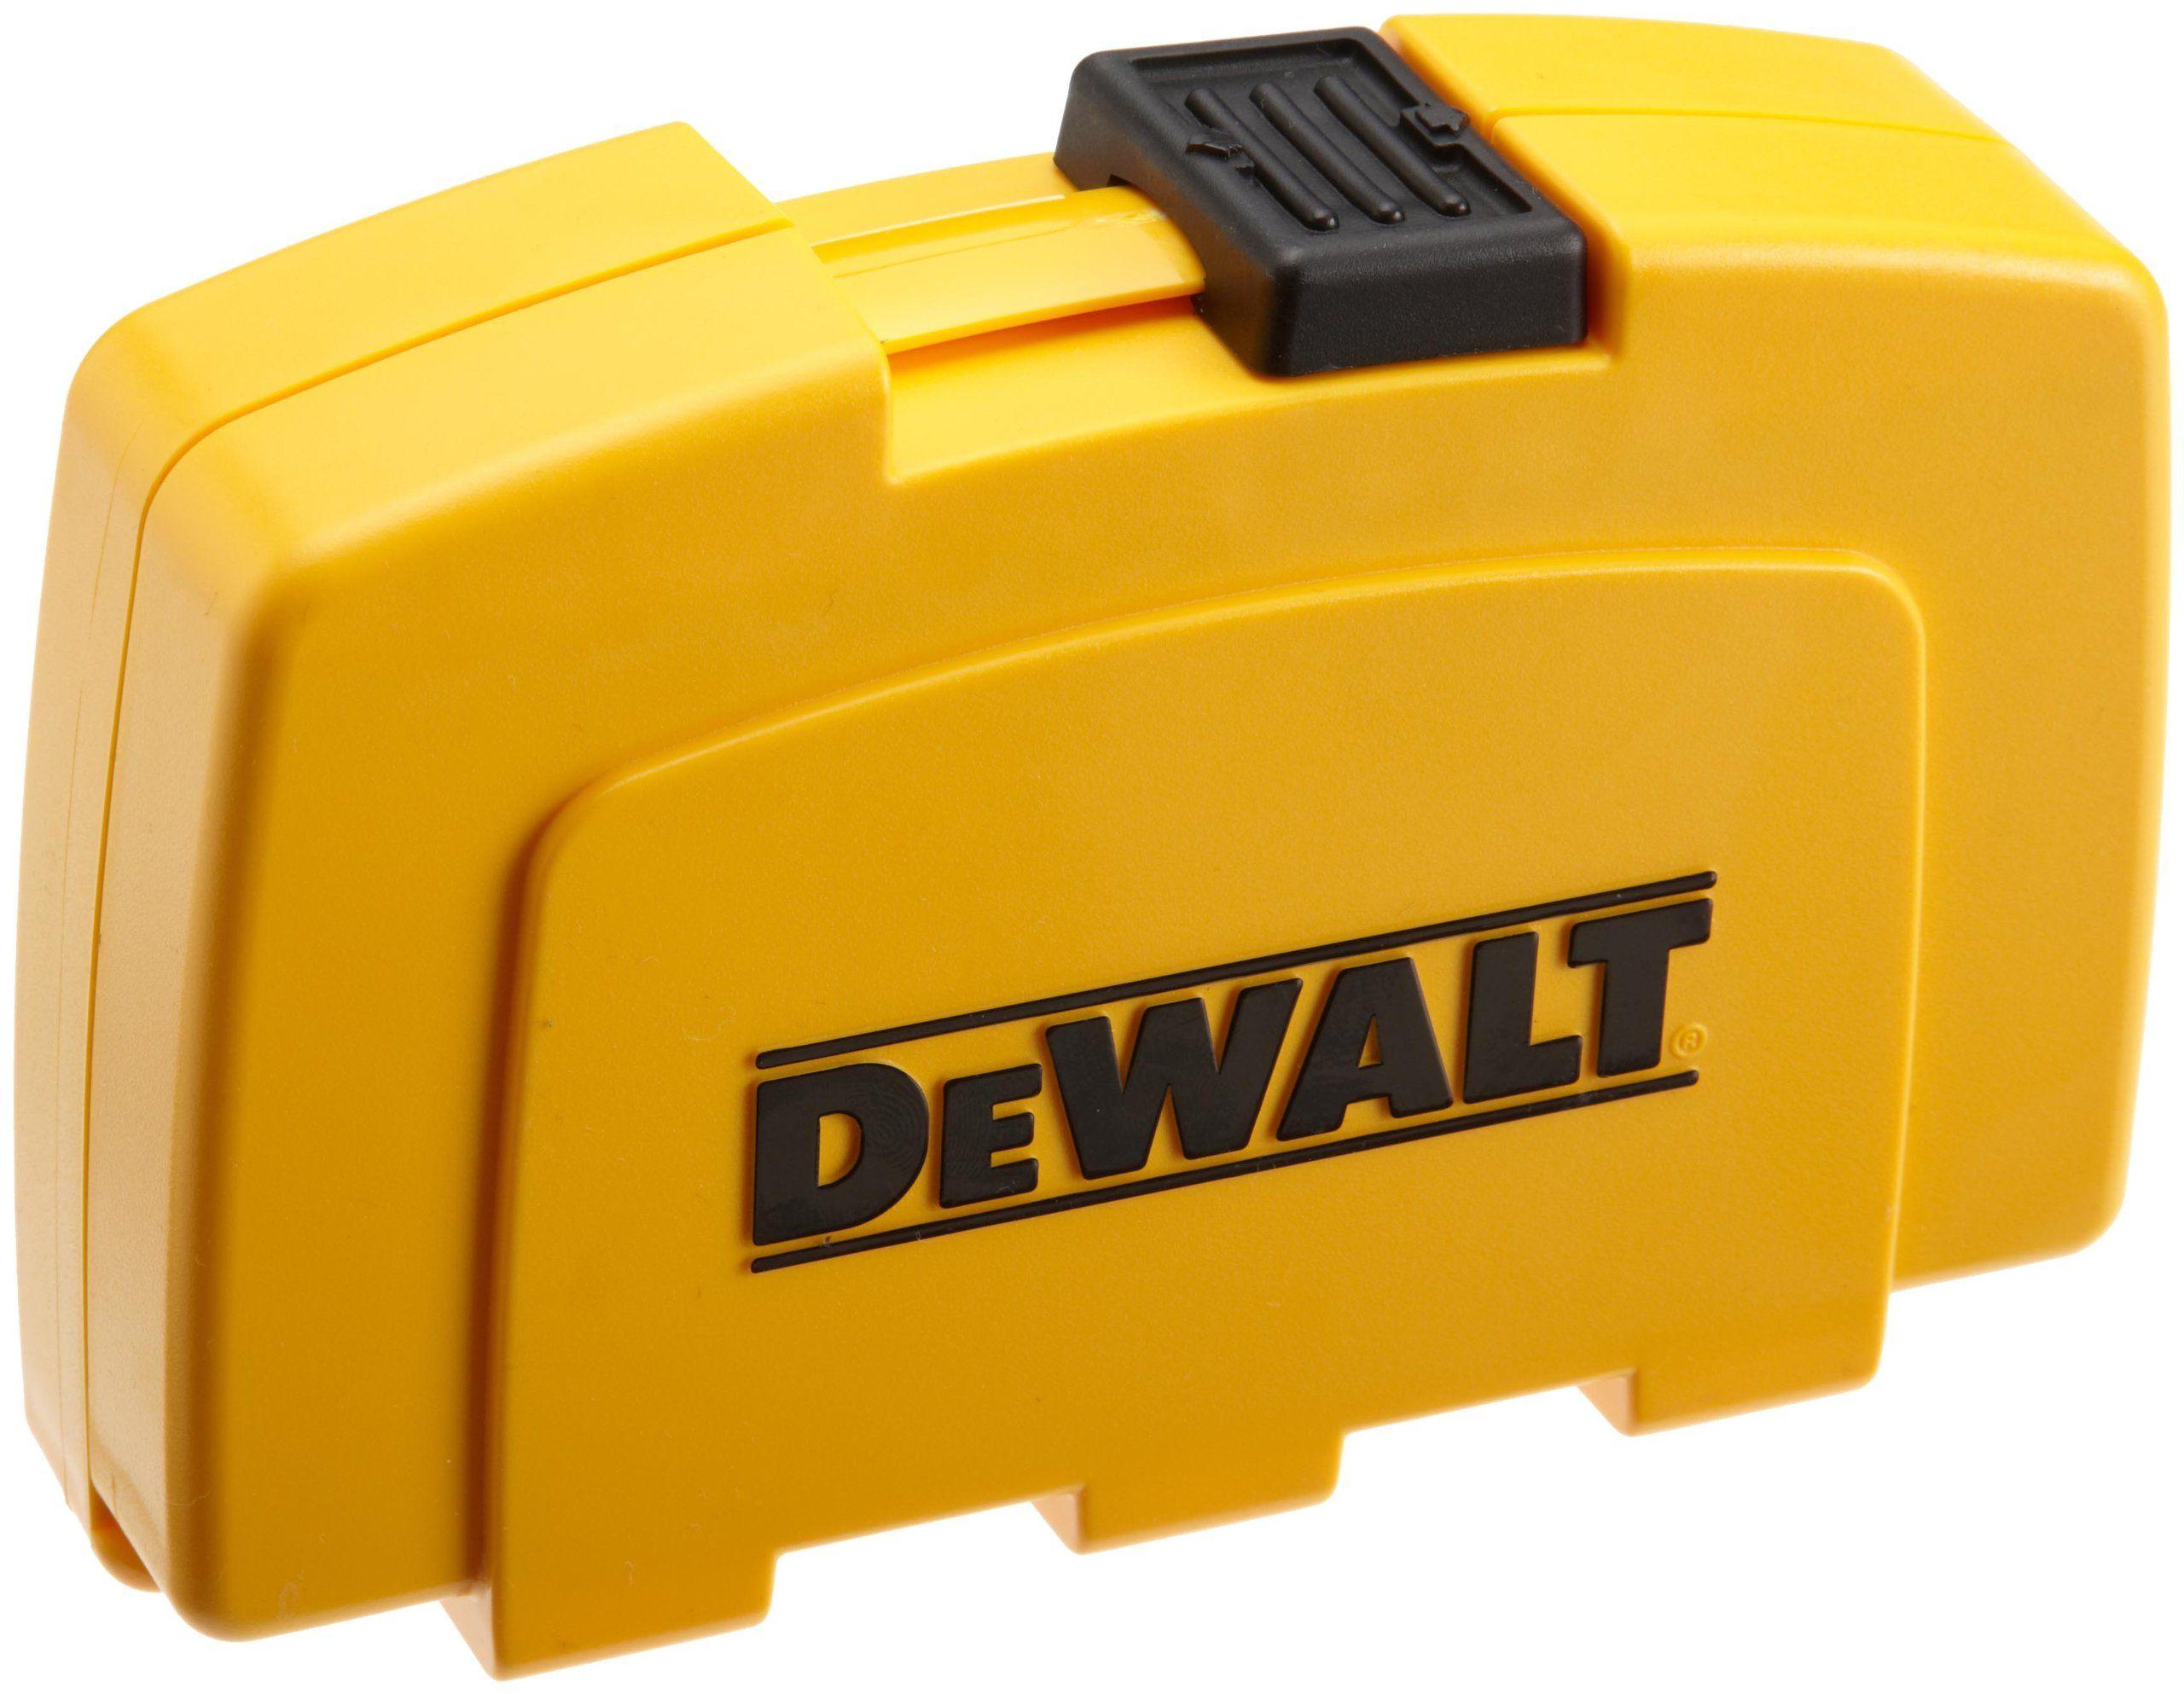 DEWALT Drill Bit Set with Pilot Point DW1956 16-Piece